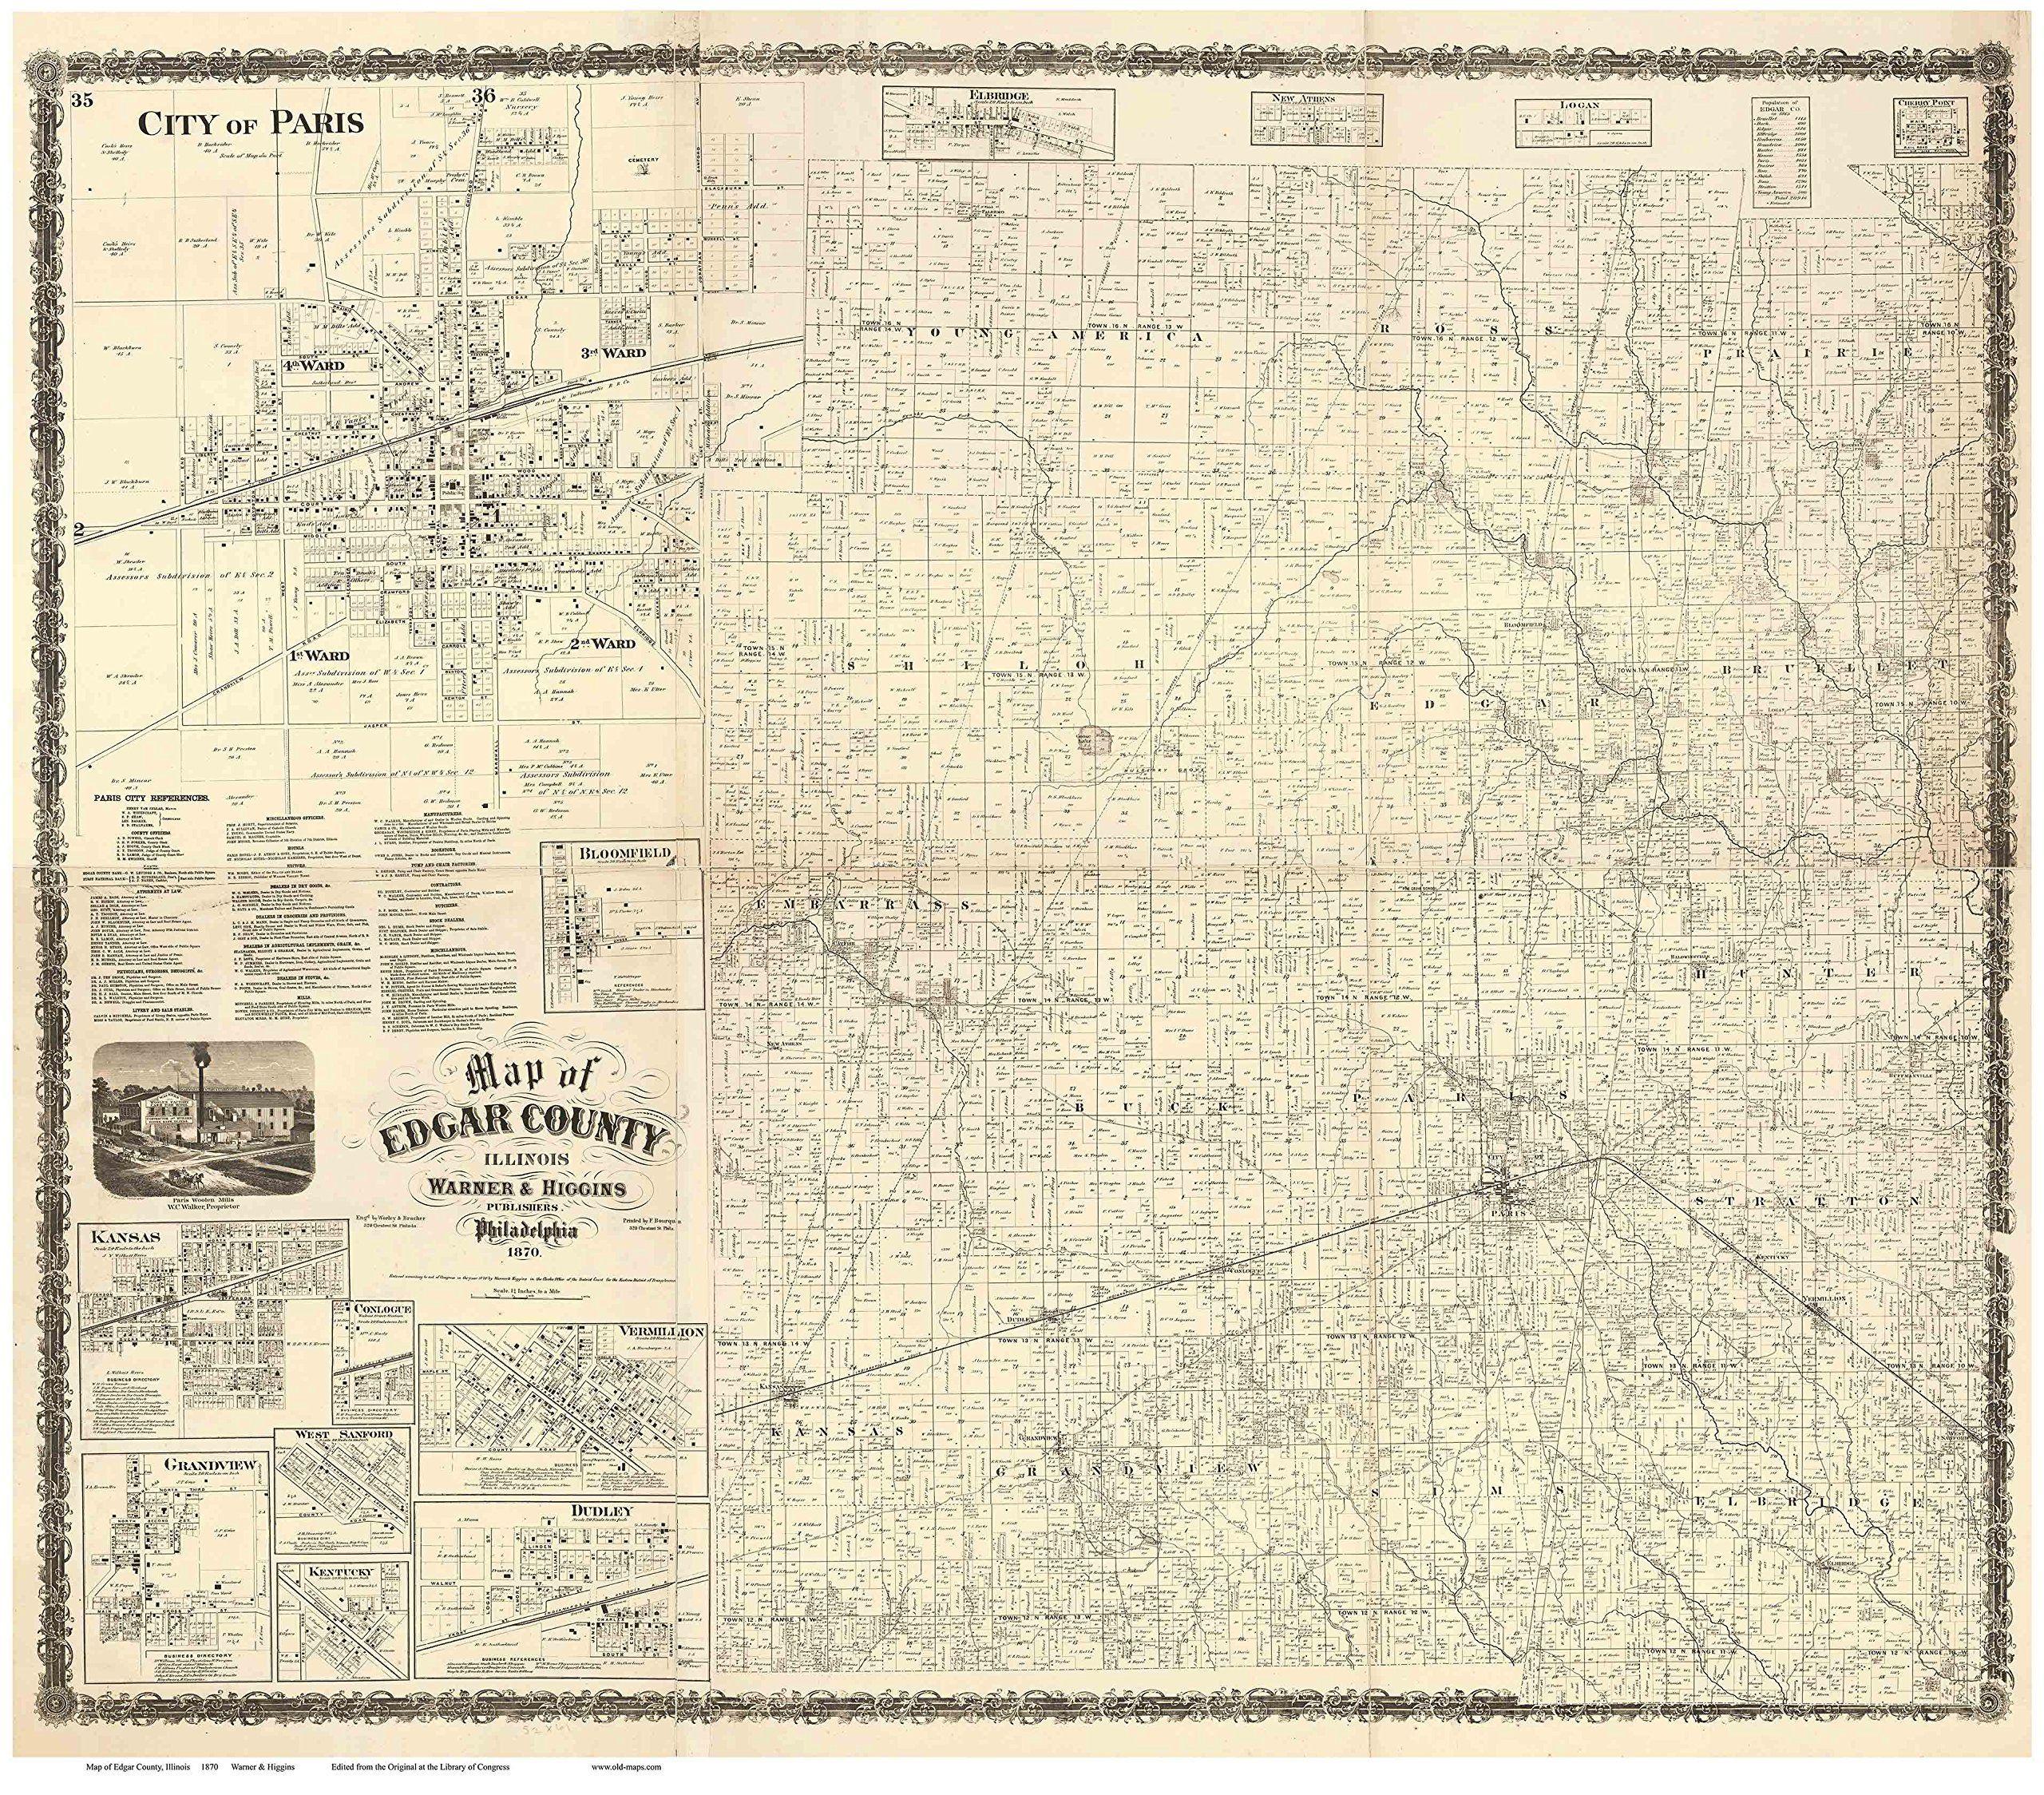 Edgar county illinois wall map reprint with homeowner names